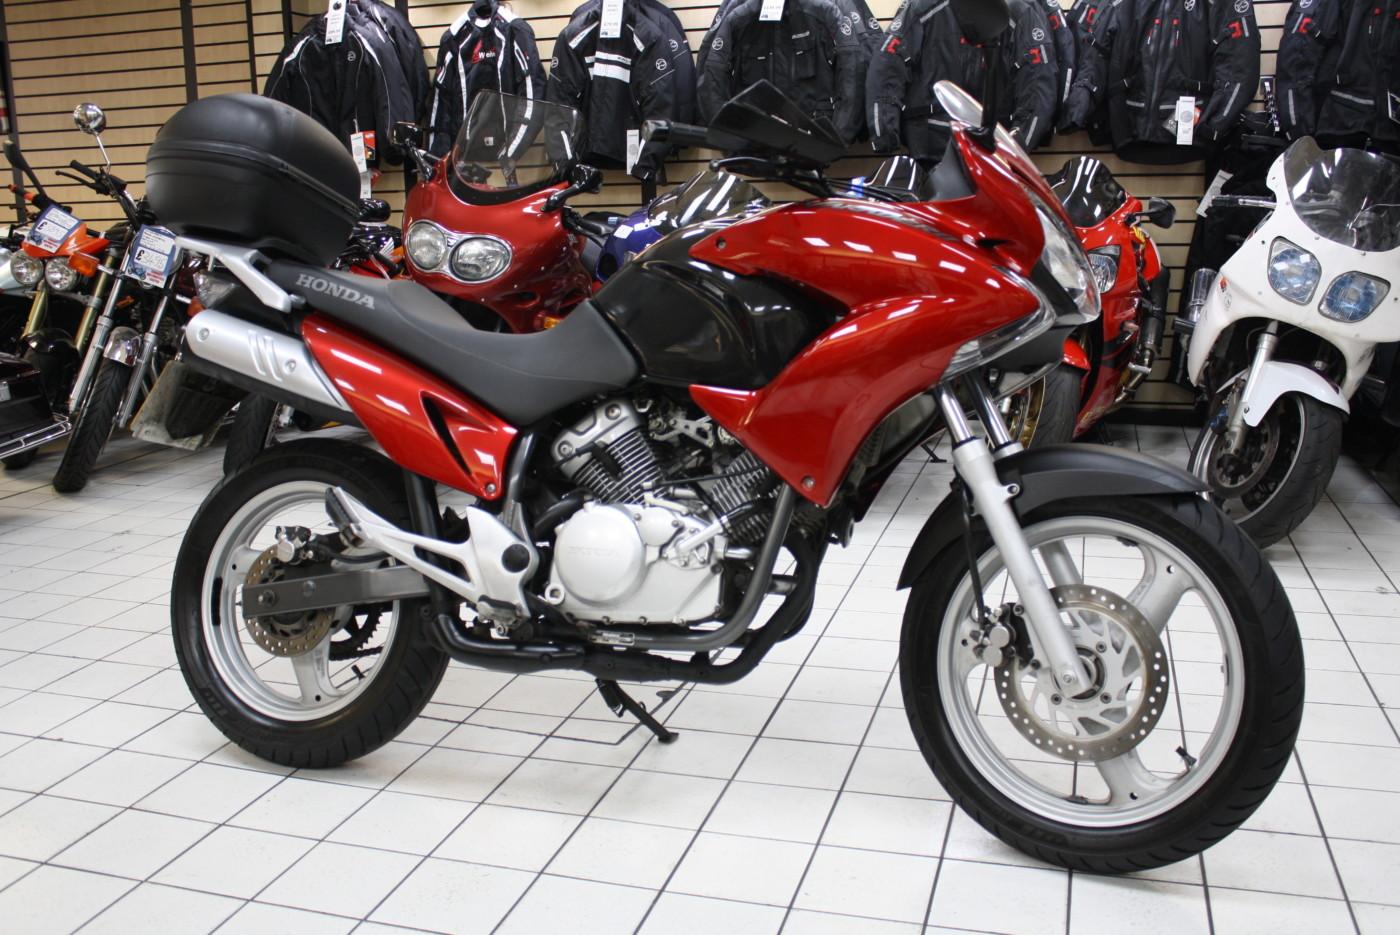 Honda XL125 Varadeo 125cc